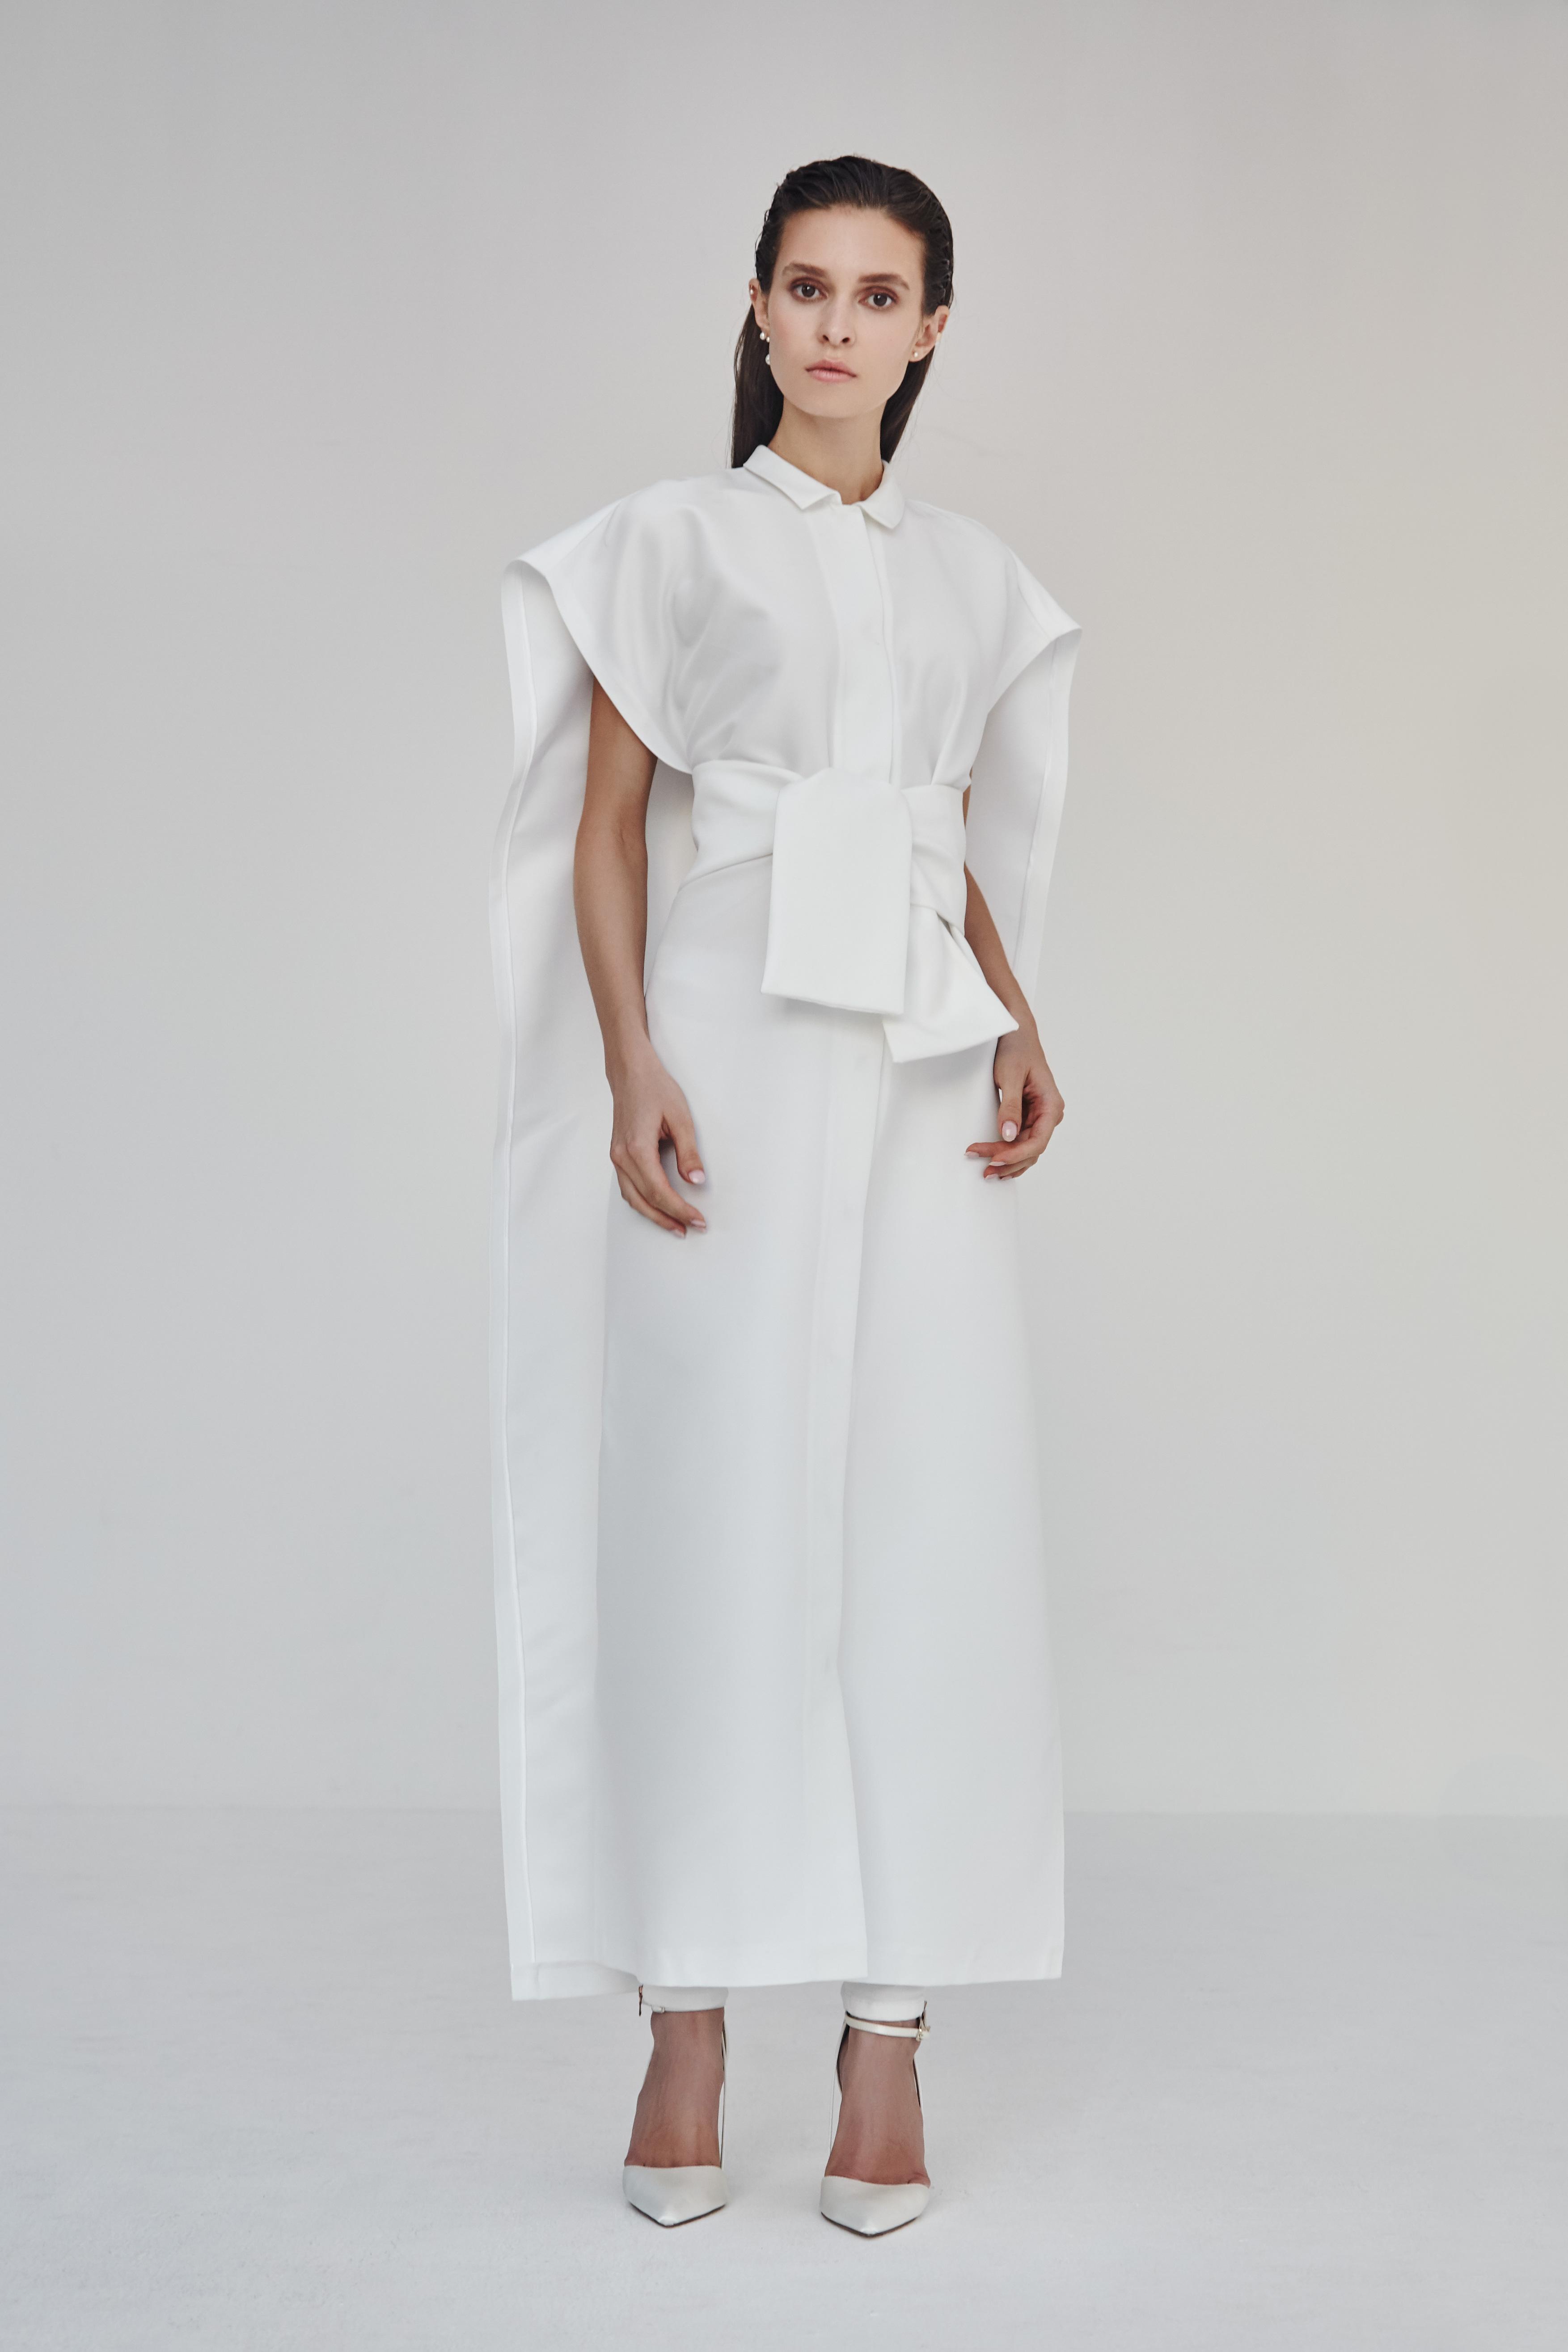 3.8-white-lookbook